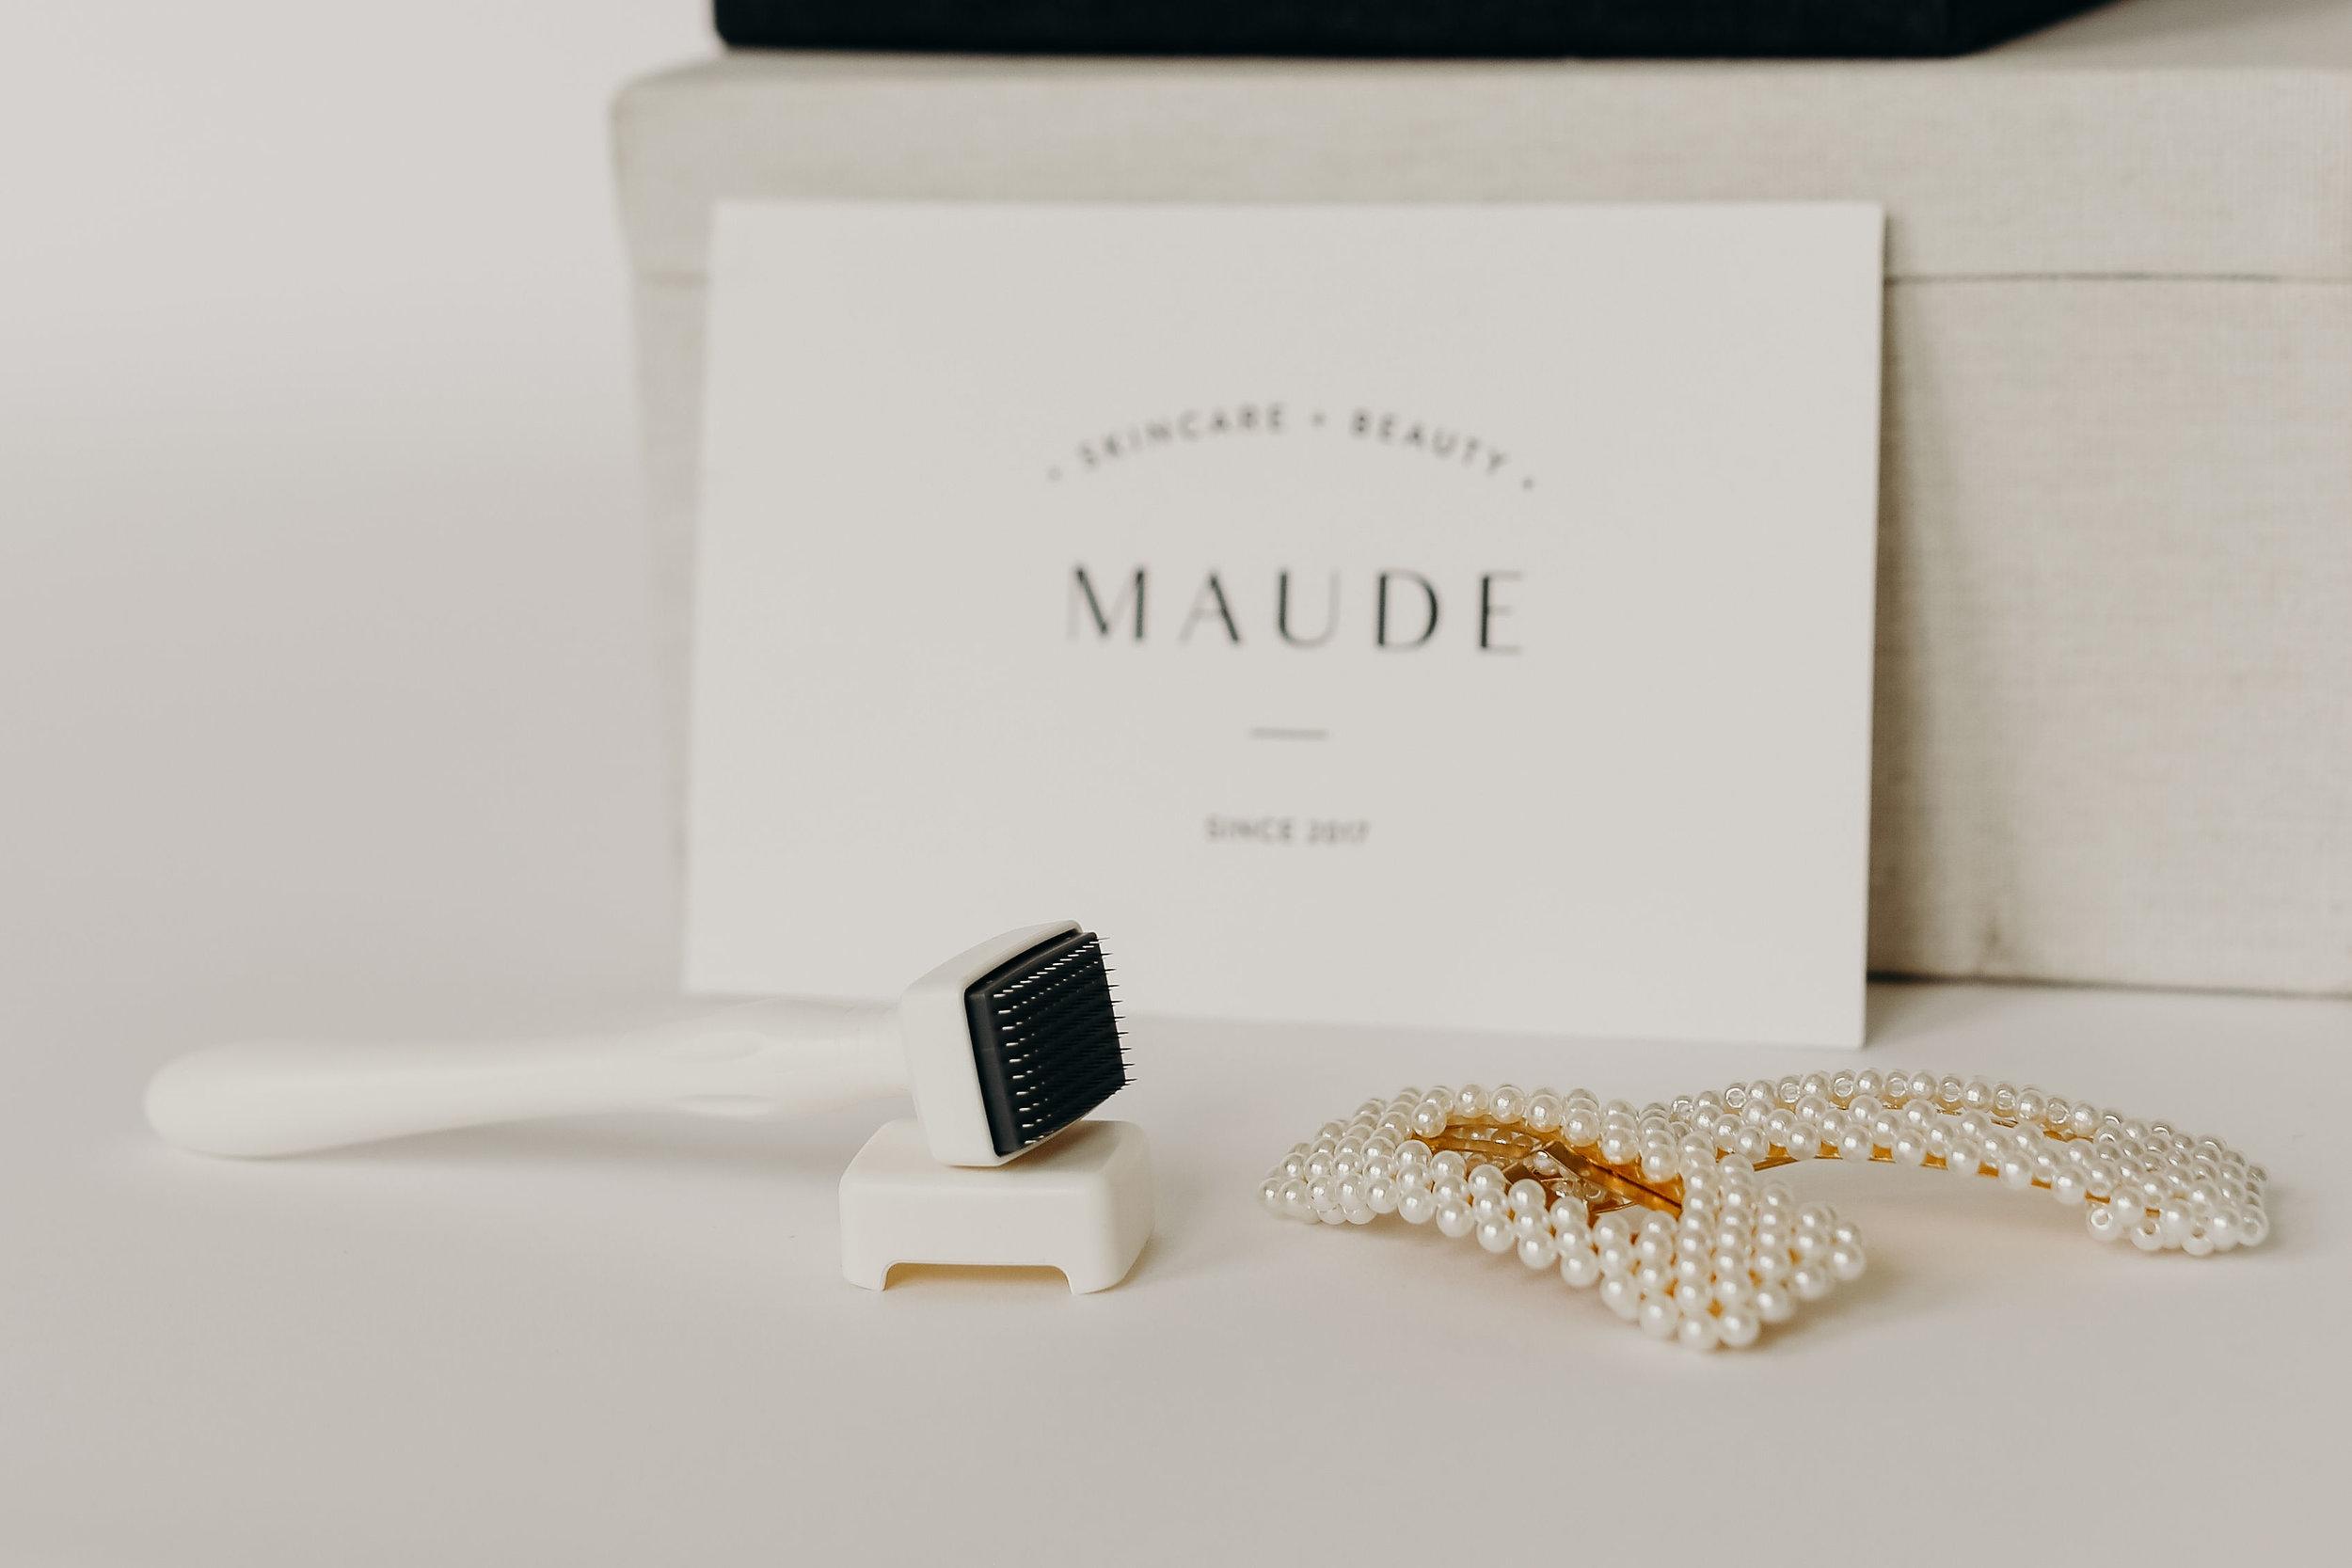 Maude-28.jpg